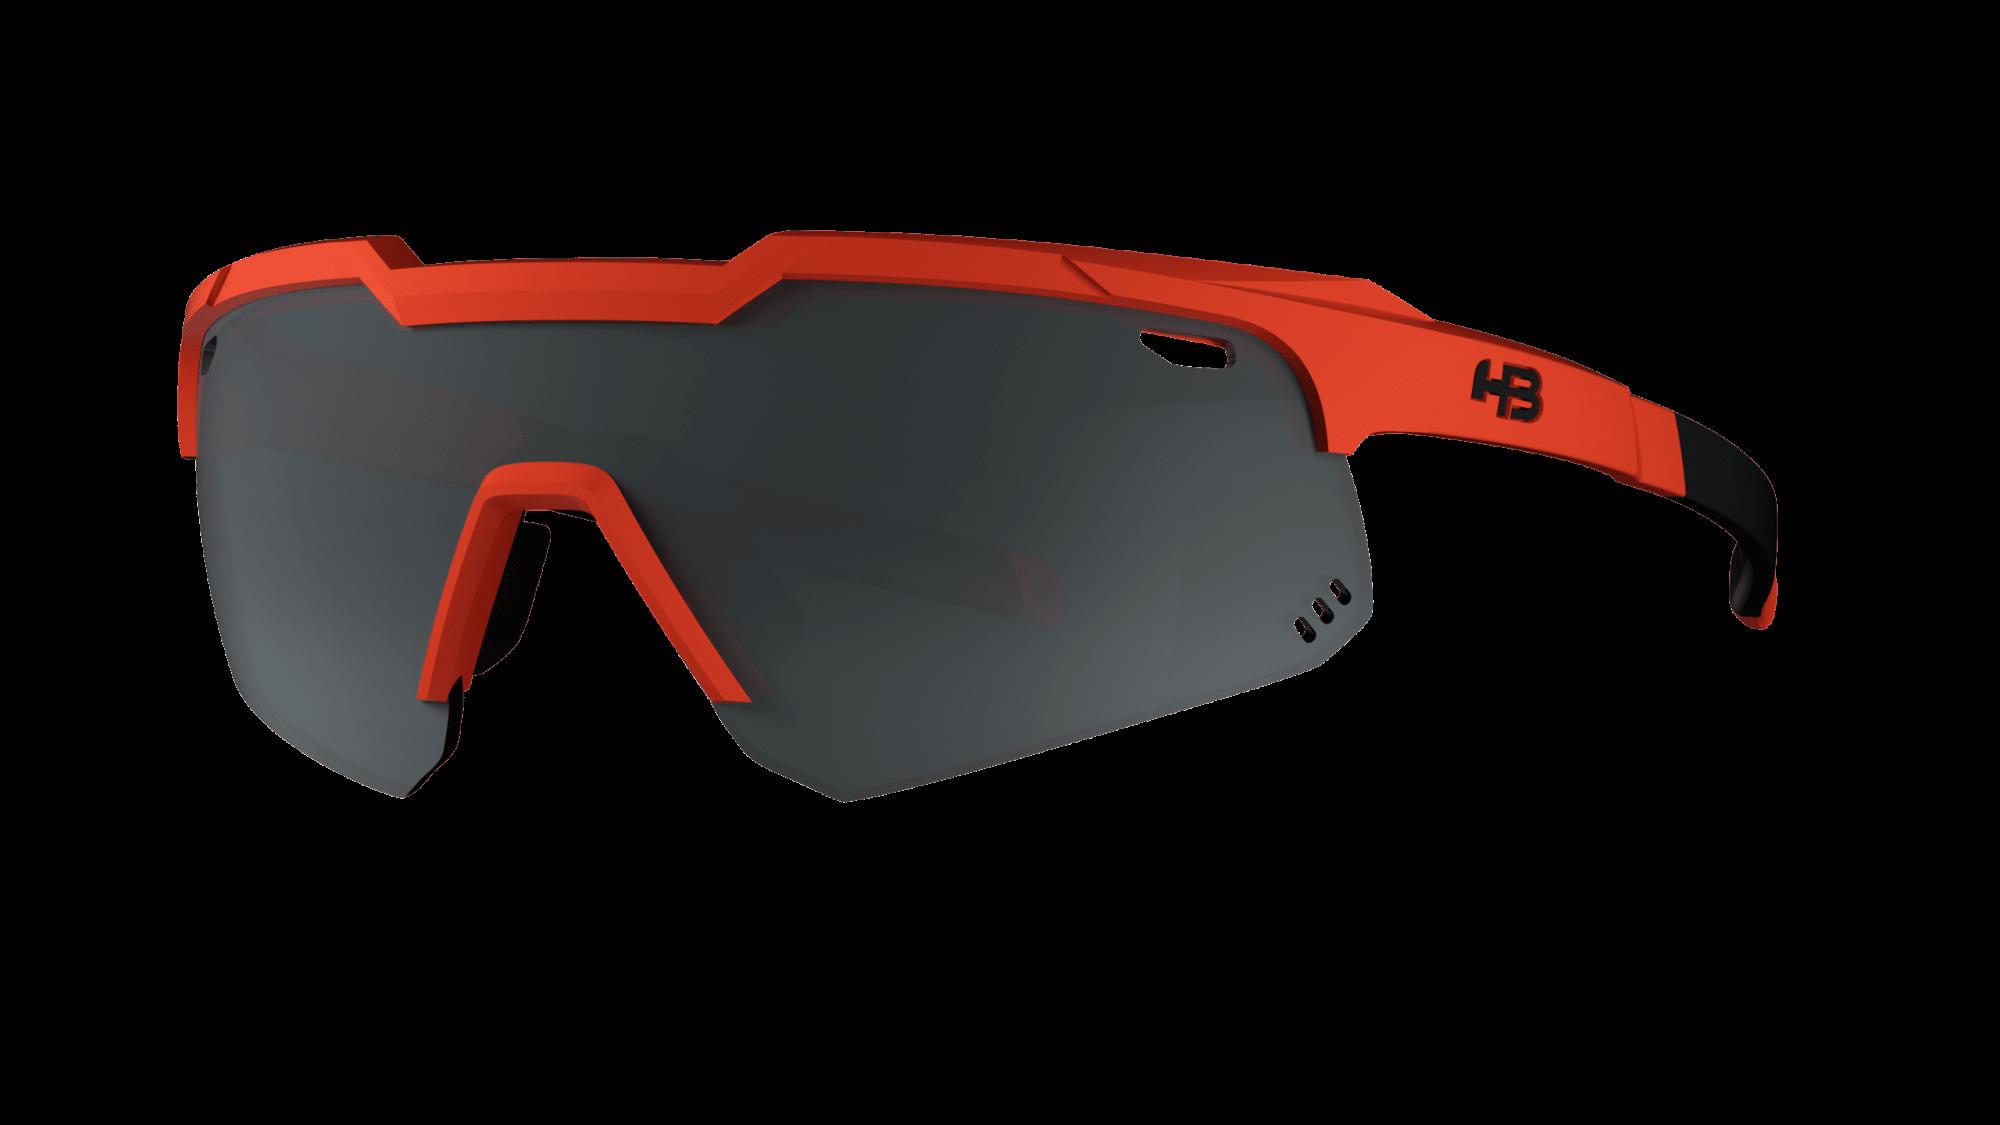 Óculos Shield Compact Small Mountain HB Matte Orange Silver